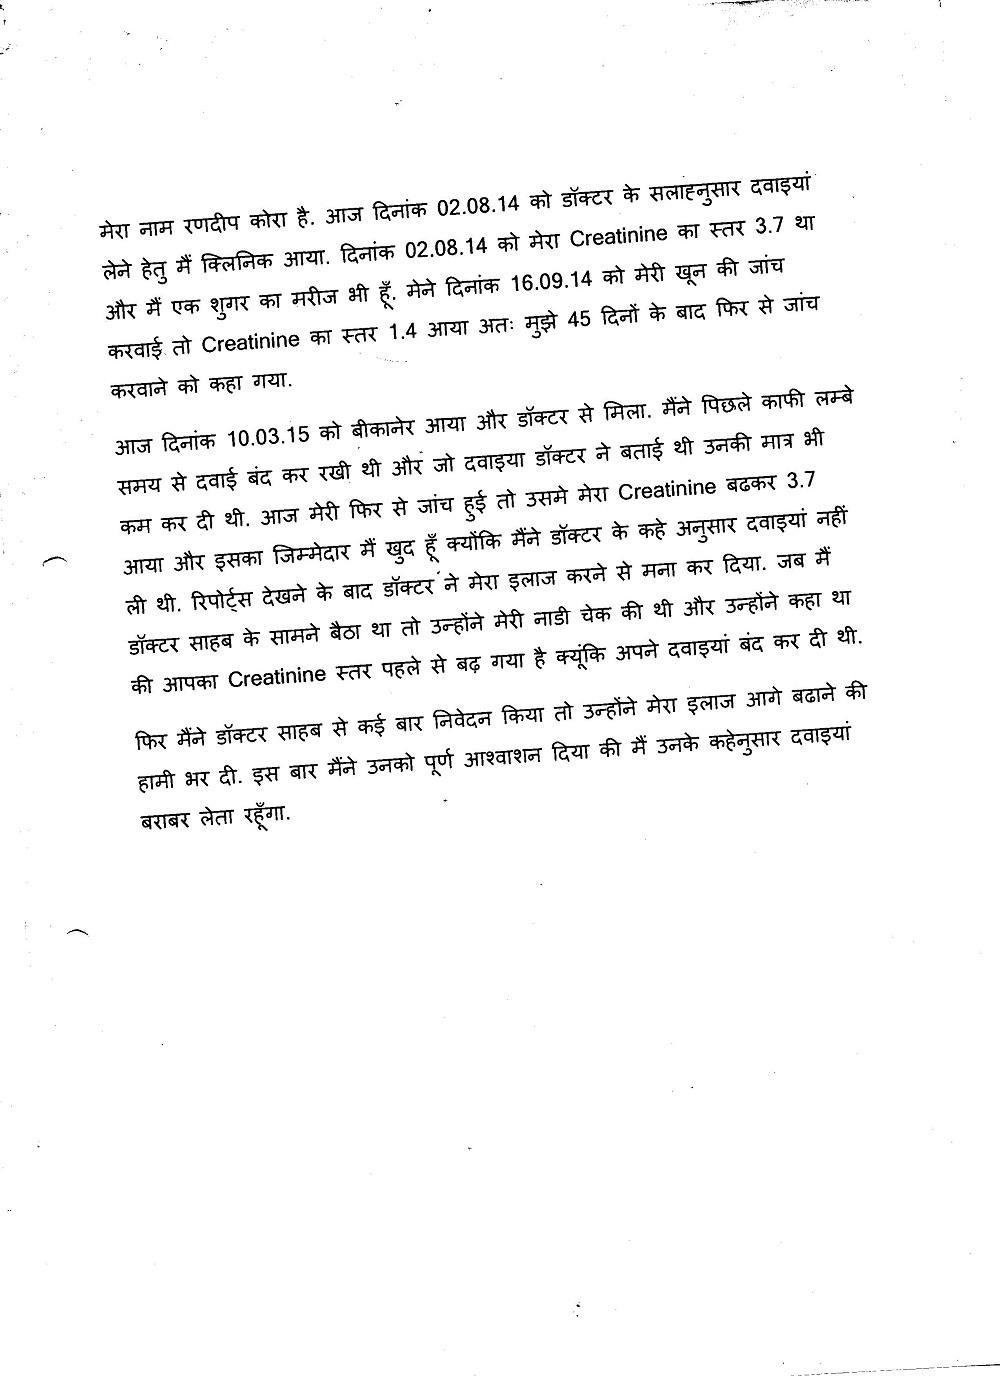 randeep-kumar-kaura-fatty-liver-kindey-failure-patient-treatment-3